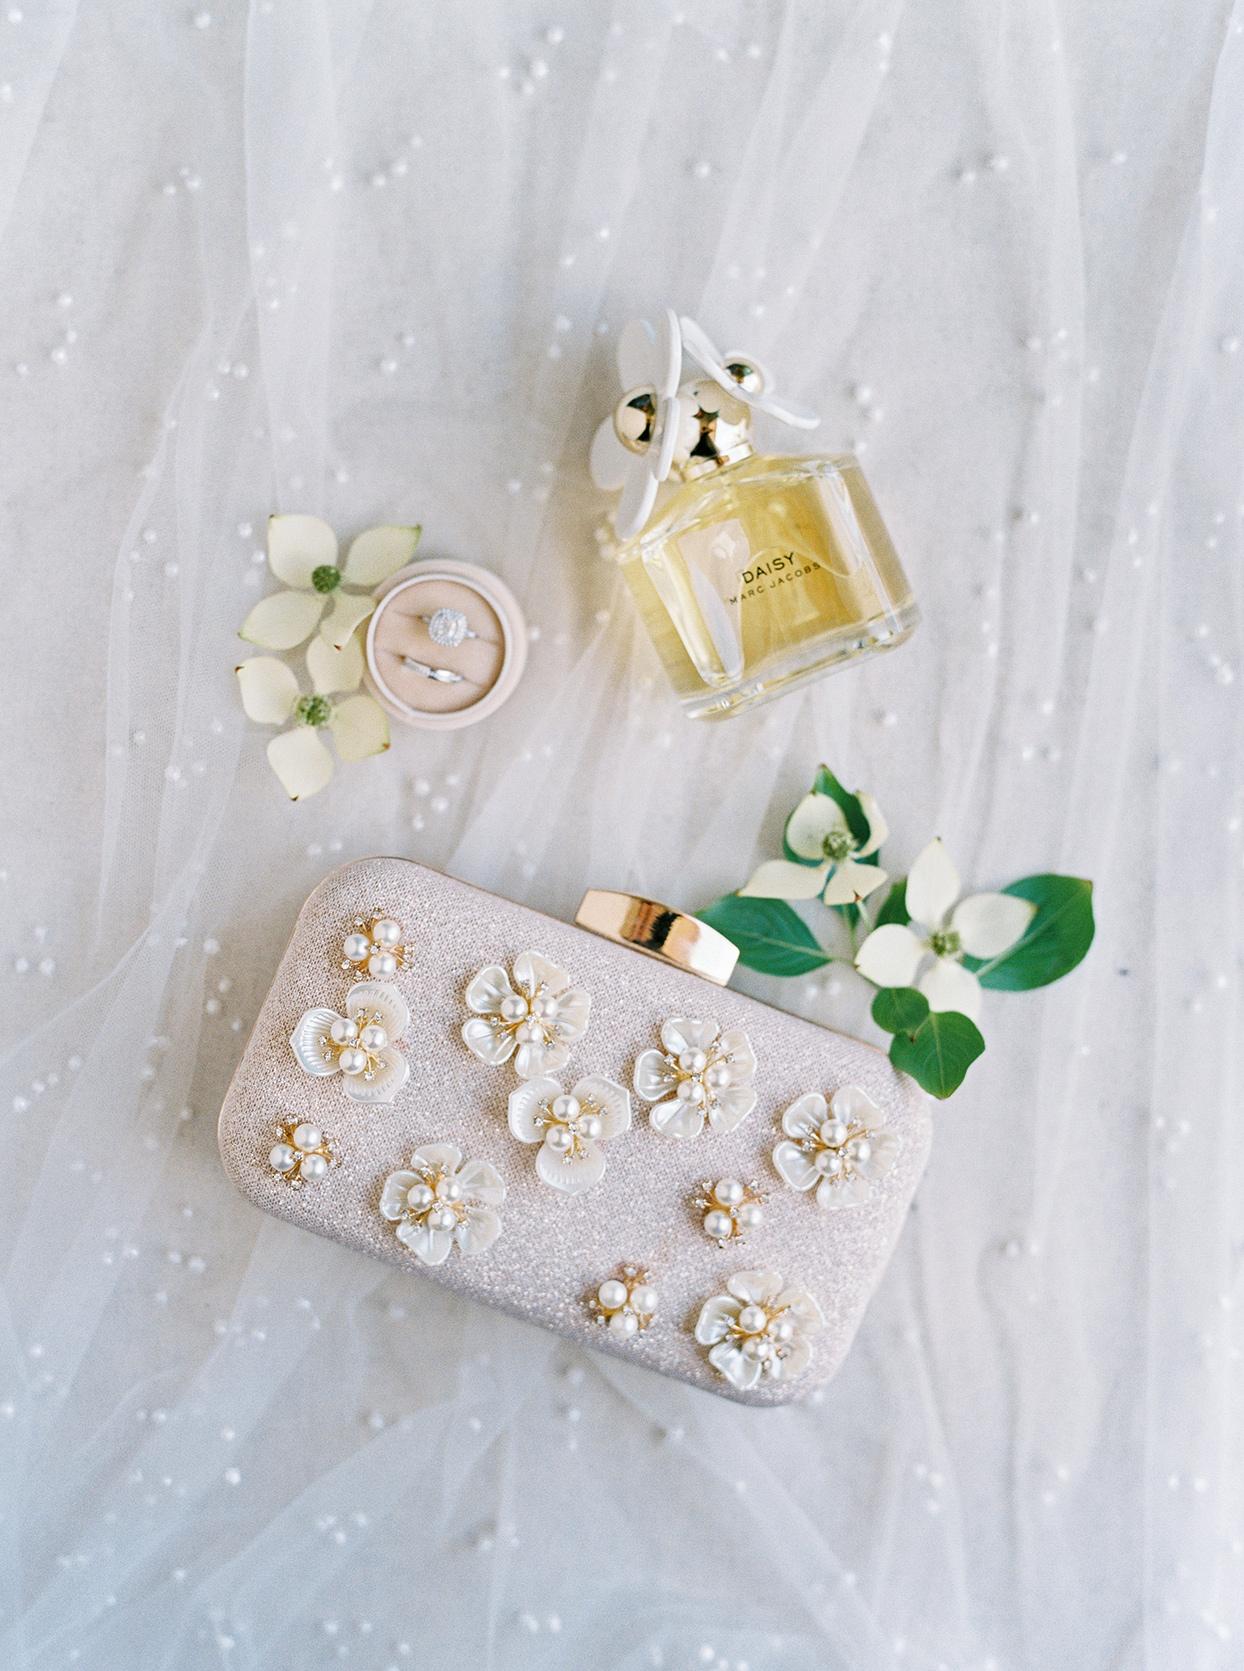 thuy kahn wedding clutch, rings, perfume